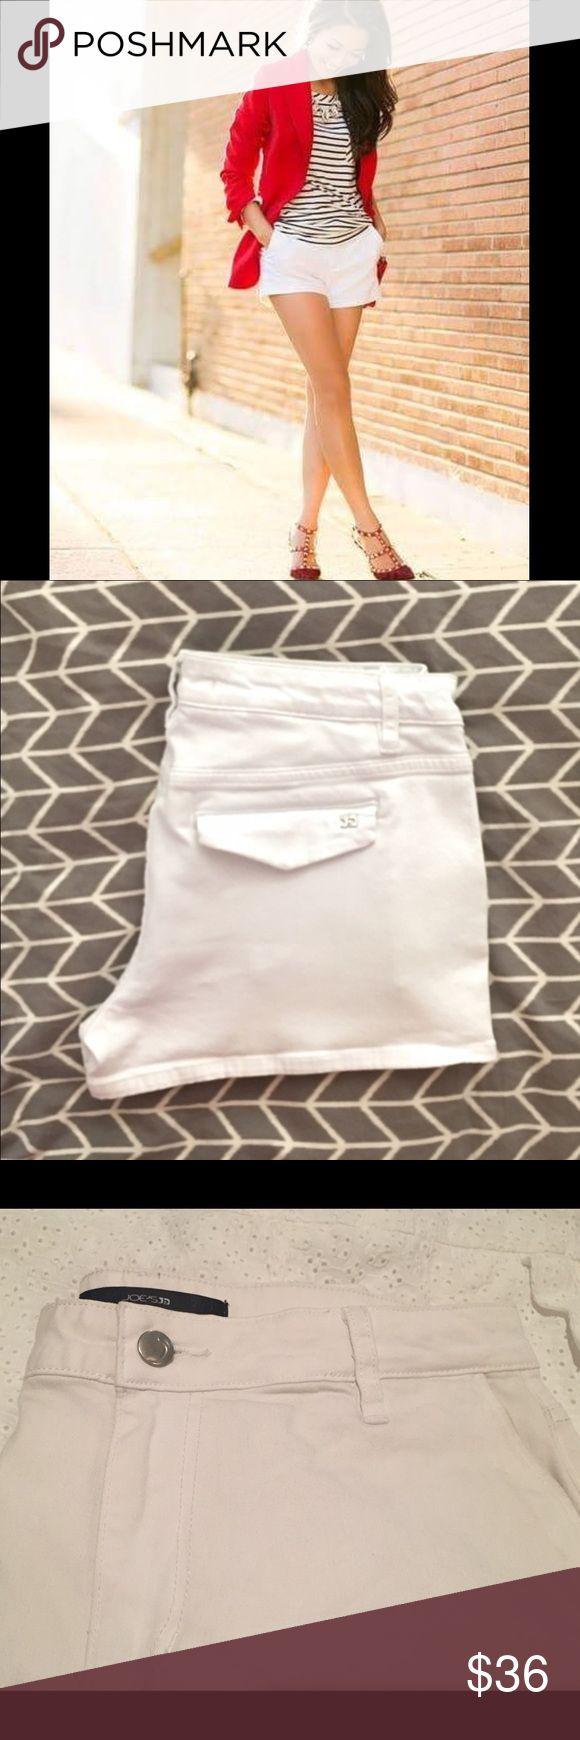 JOE'S JEAN SHORTS A summer must have! Joe's  trouser white jean shorts. In great condition. Joe's Jeans Shorts Jean Shorts